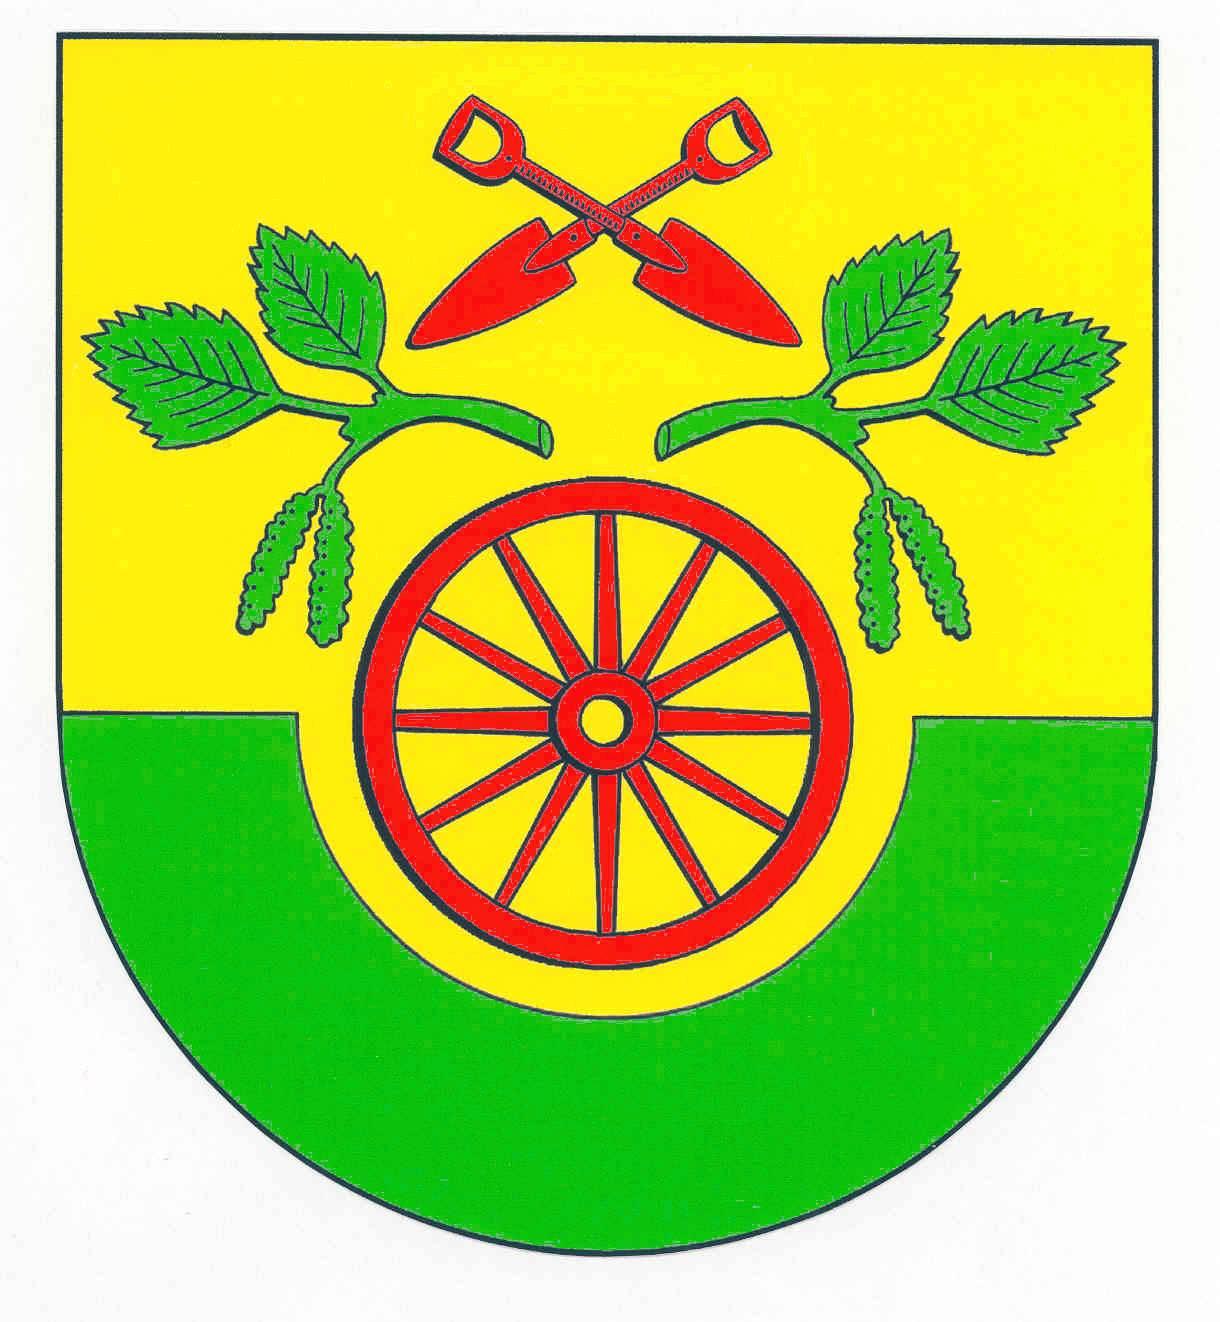 Wappen GemeindeDaldorf, Kreis Segeberg